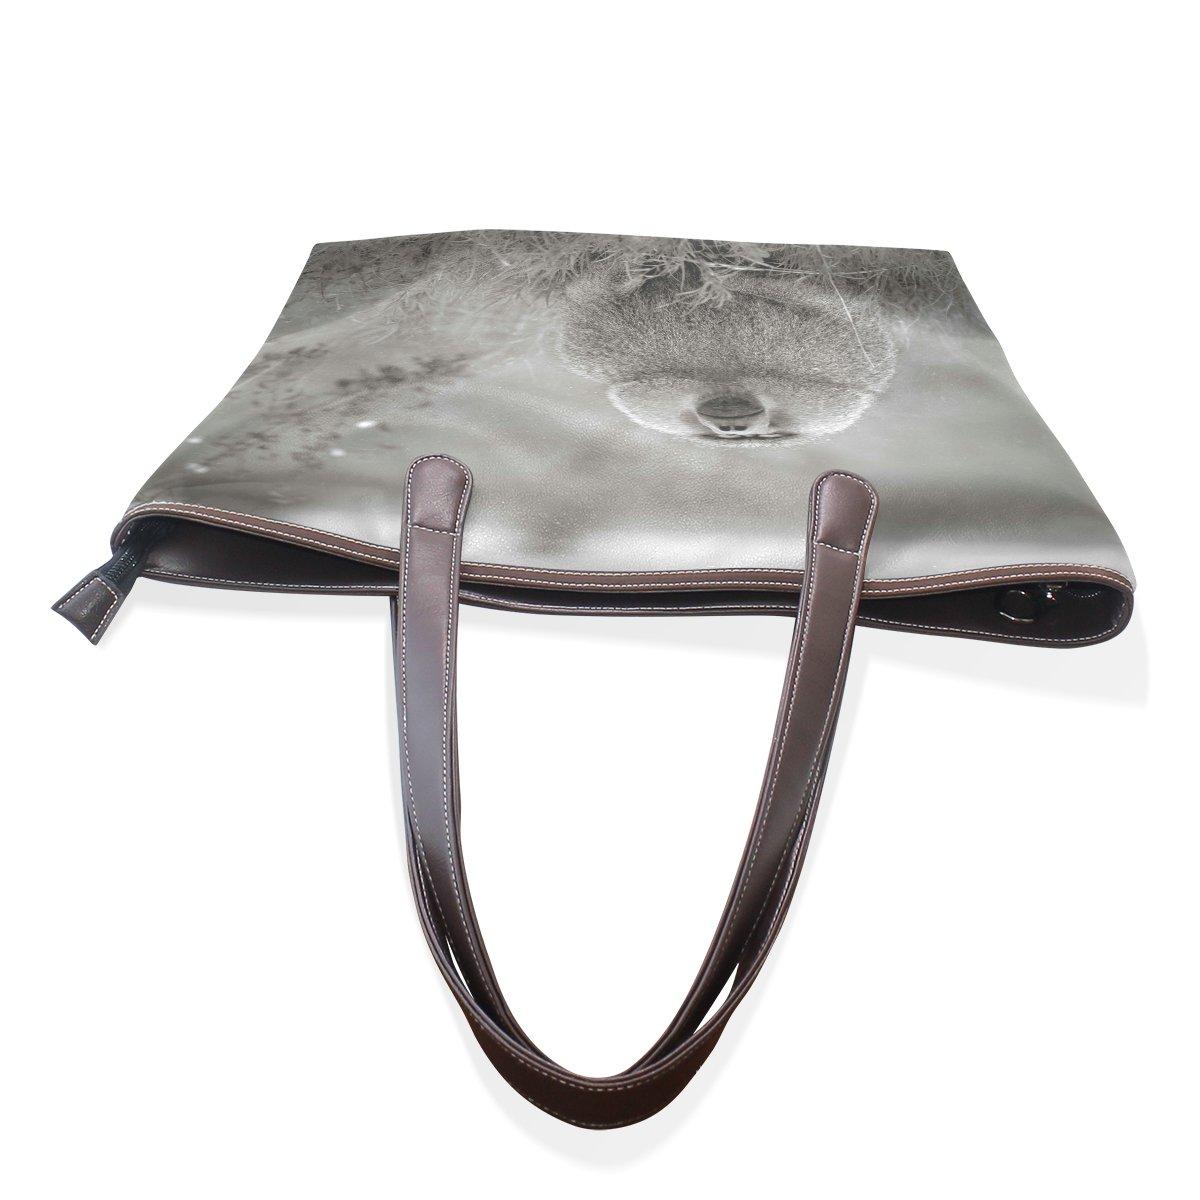 Ye Store Orangutans Lady PU Leather Handbag Tote Bag Shoulder Bag Shopping Bag